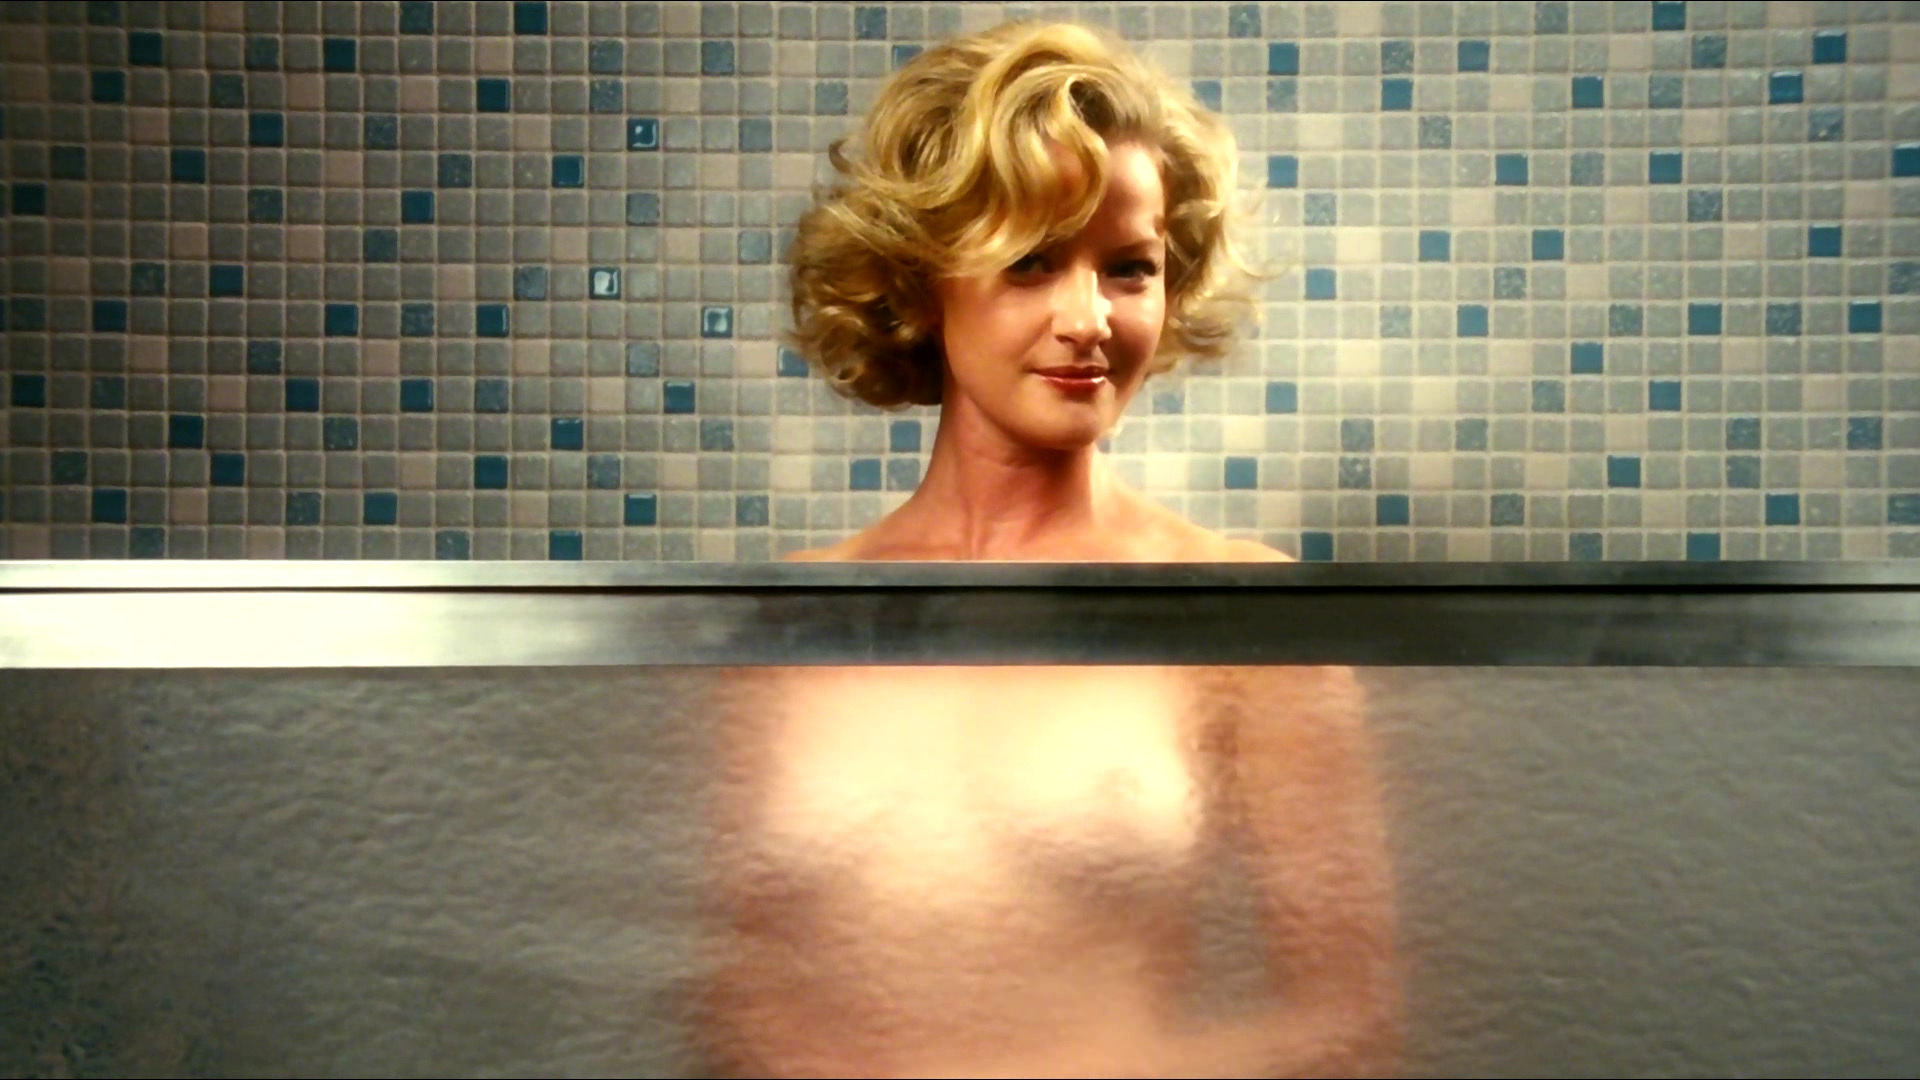 Gretchen Mol - An American Affair HD 1080p 05.jpg